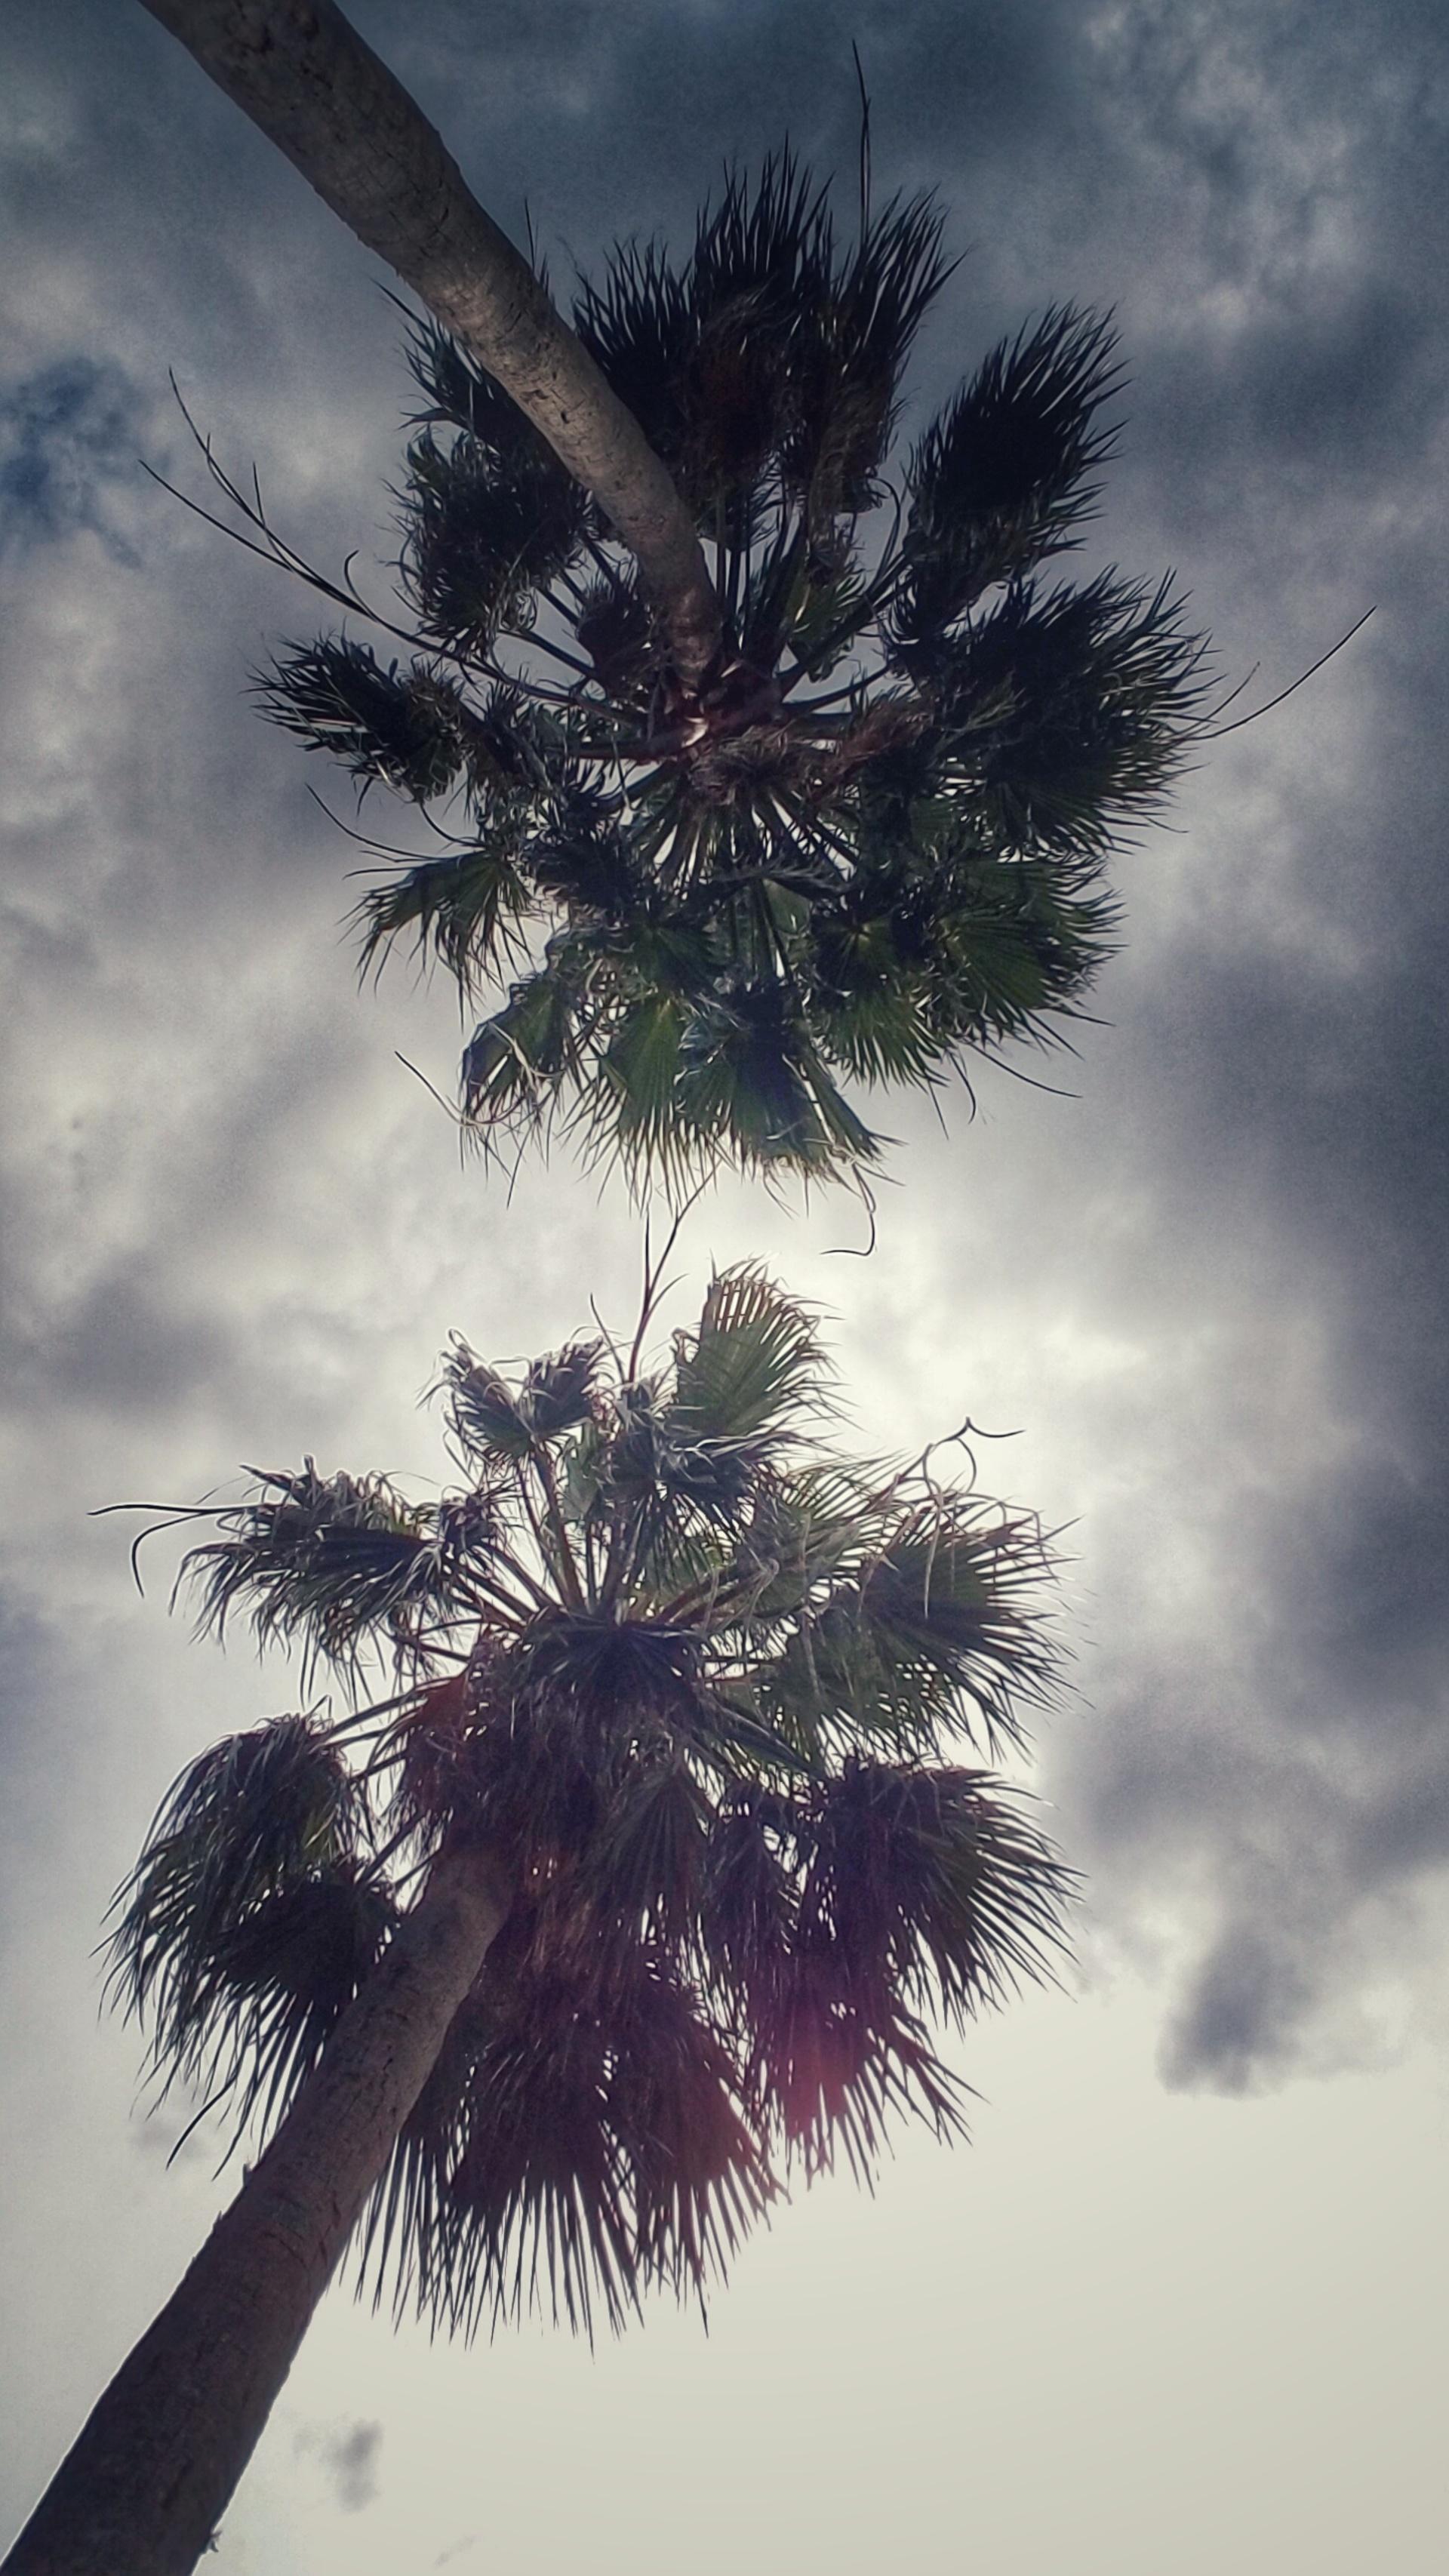 Palm tree under the sky